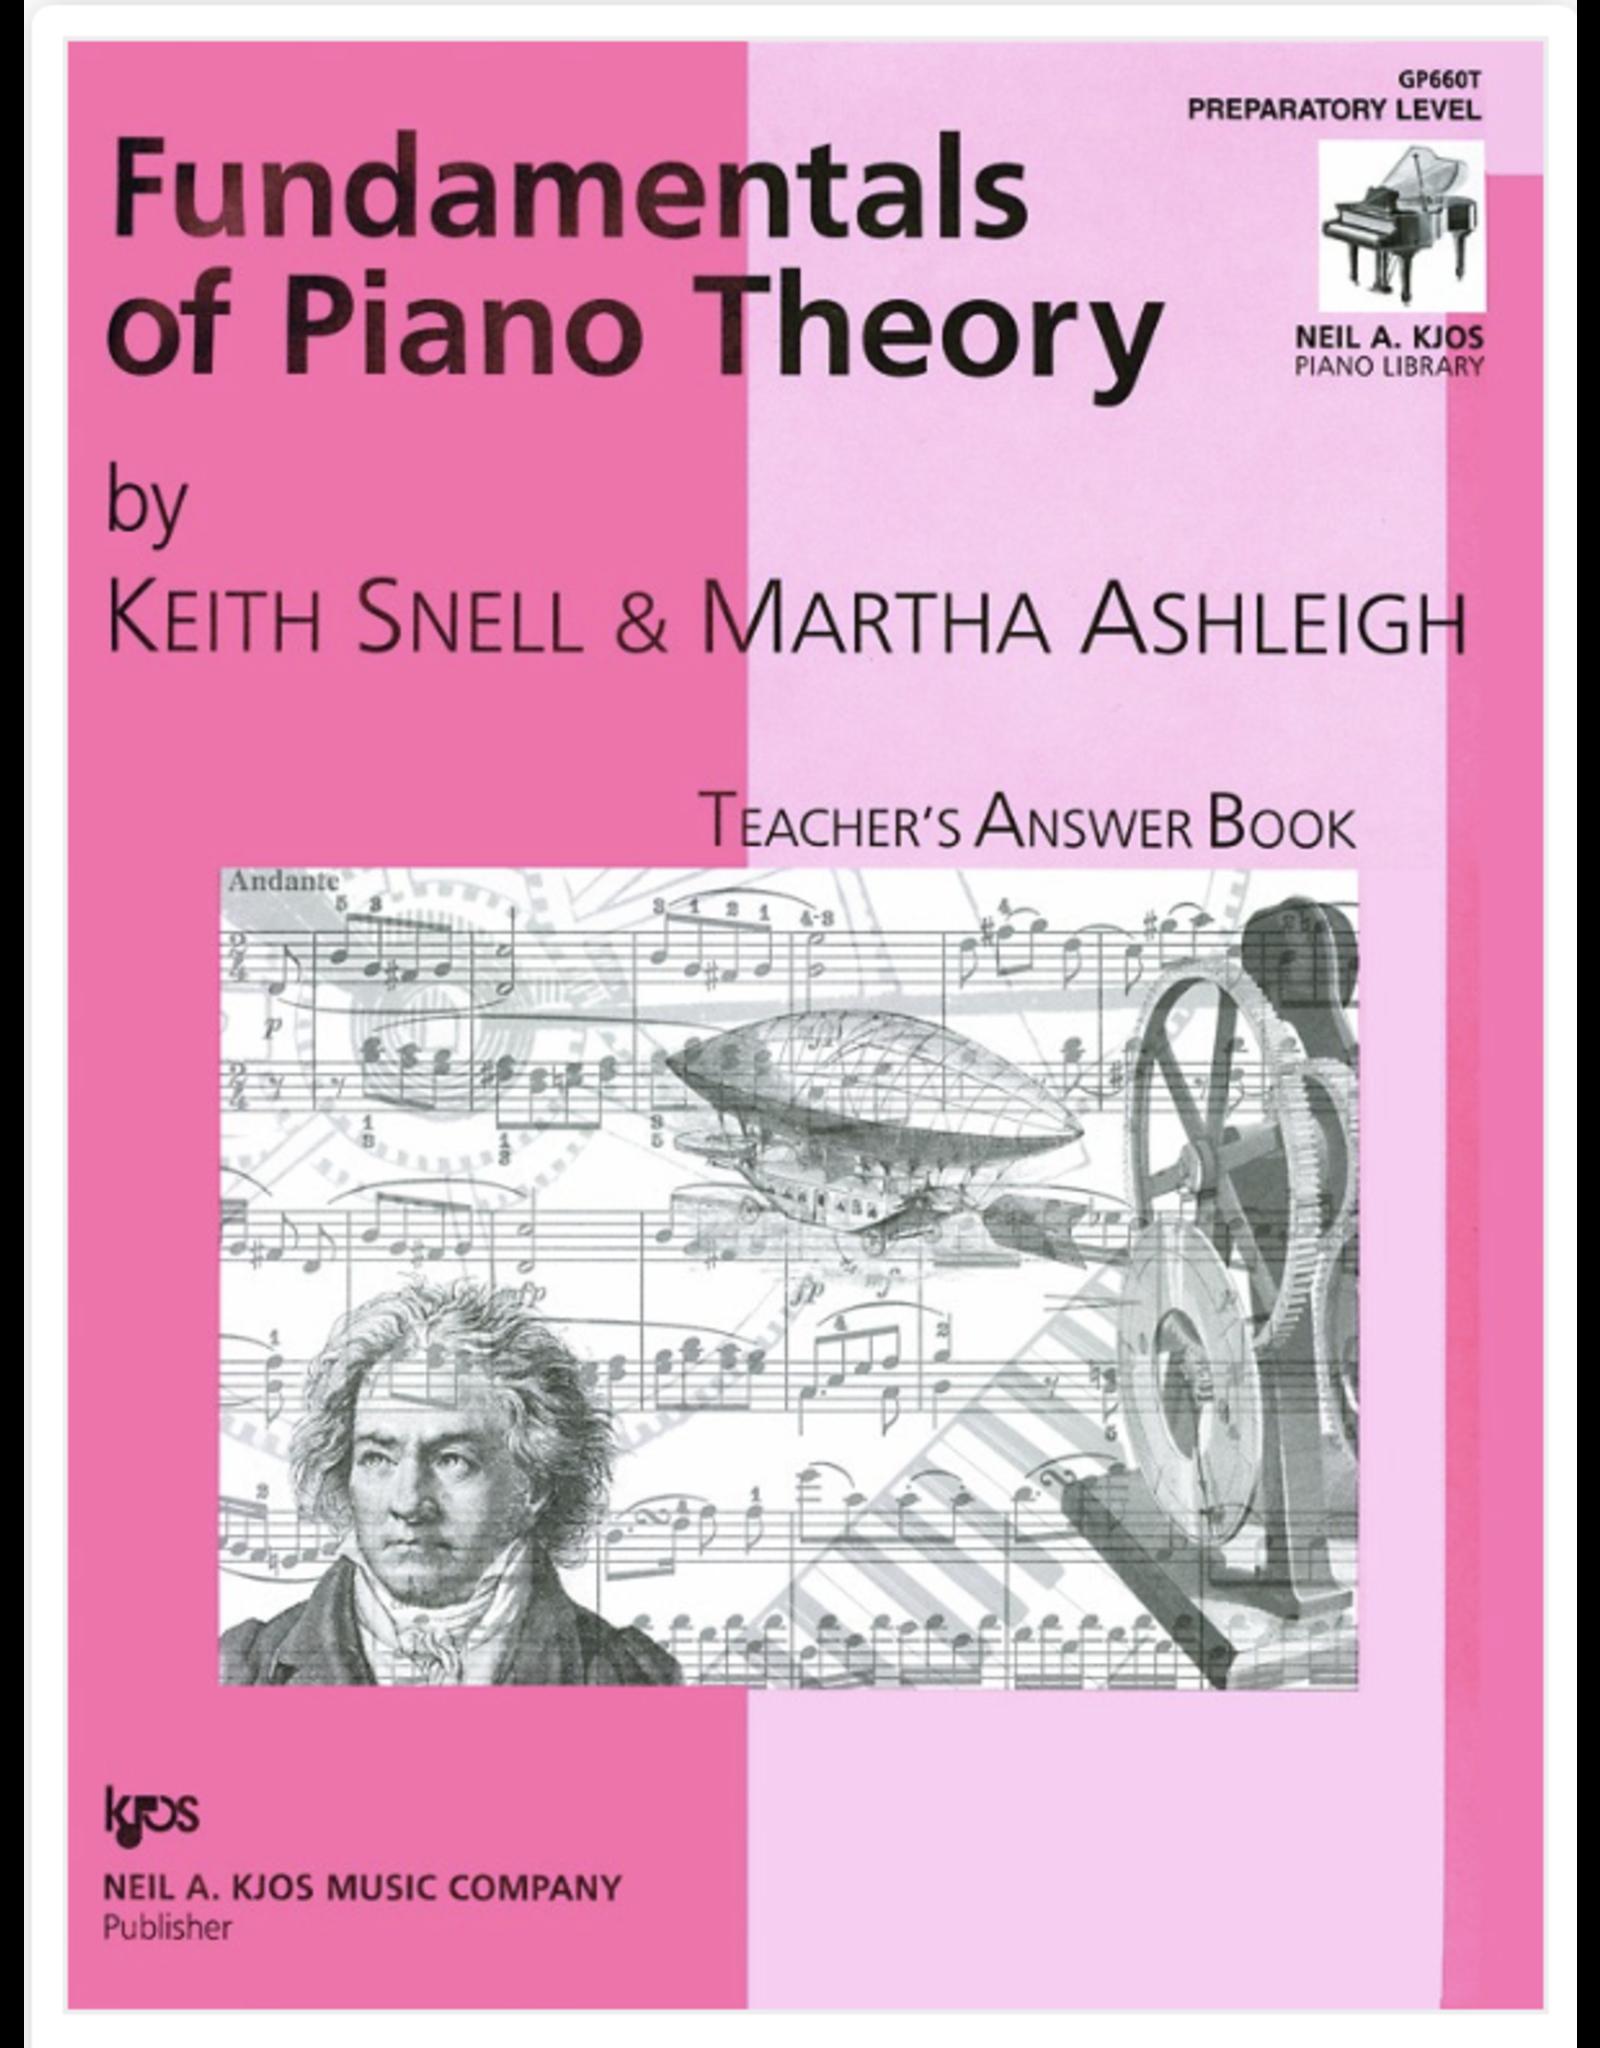 Kjos Fundamentals of Piano Theory, Prep Level Answer Book